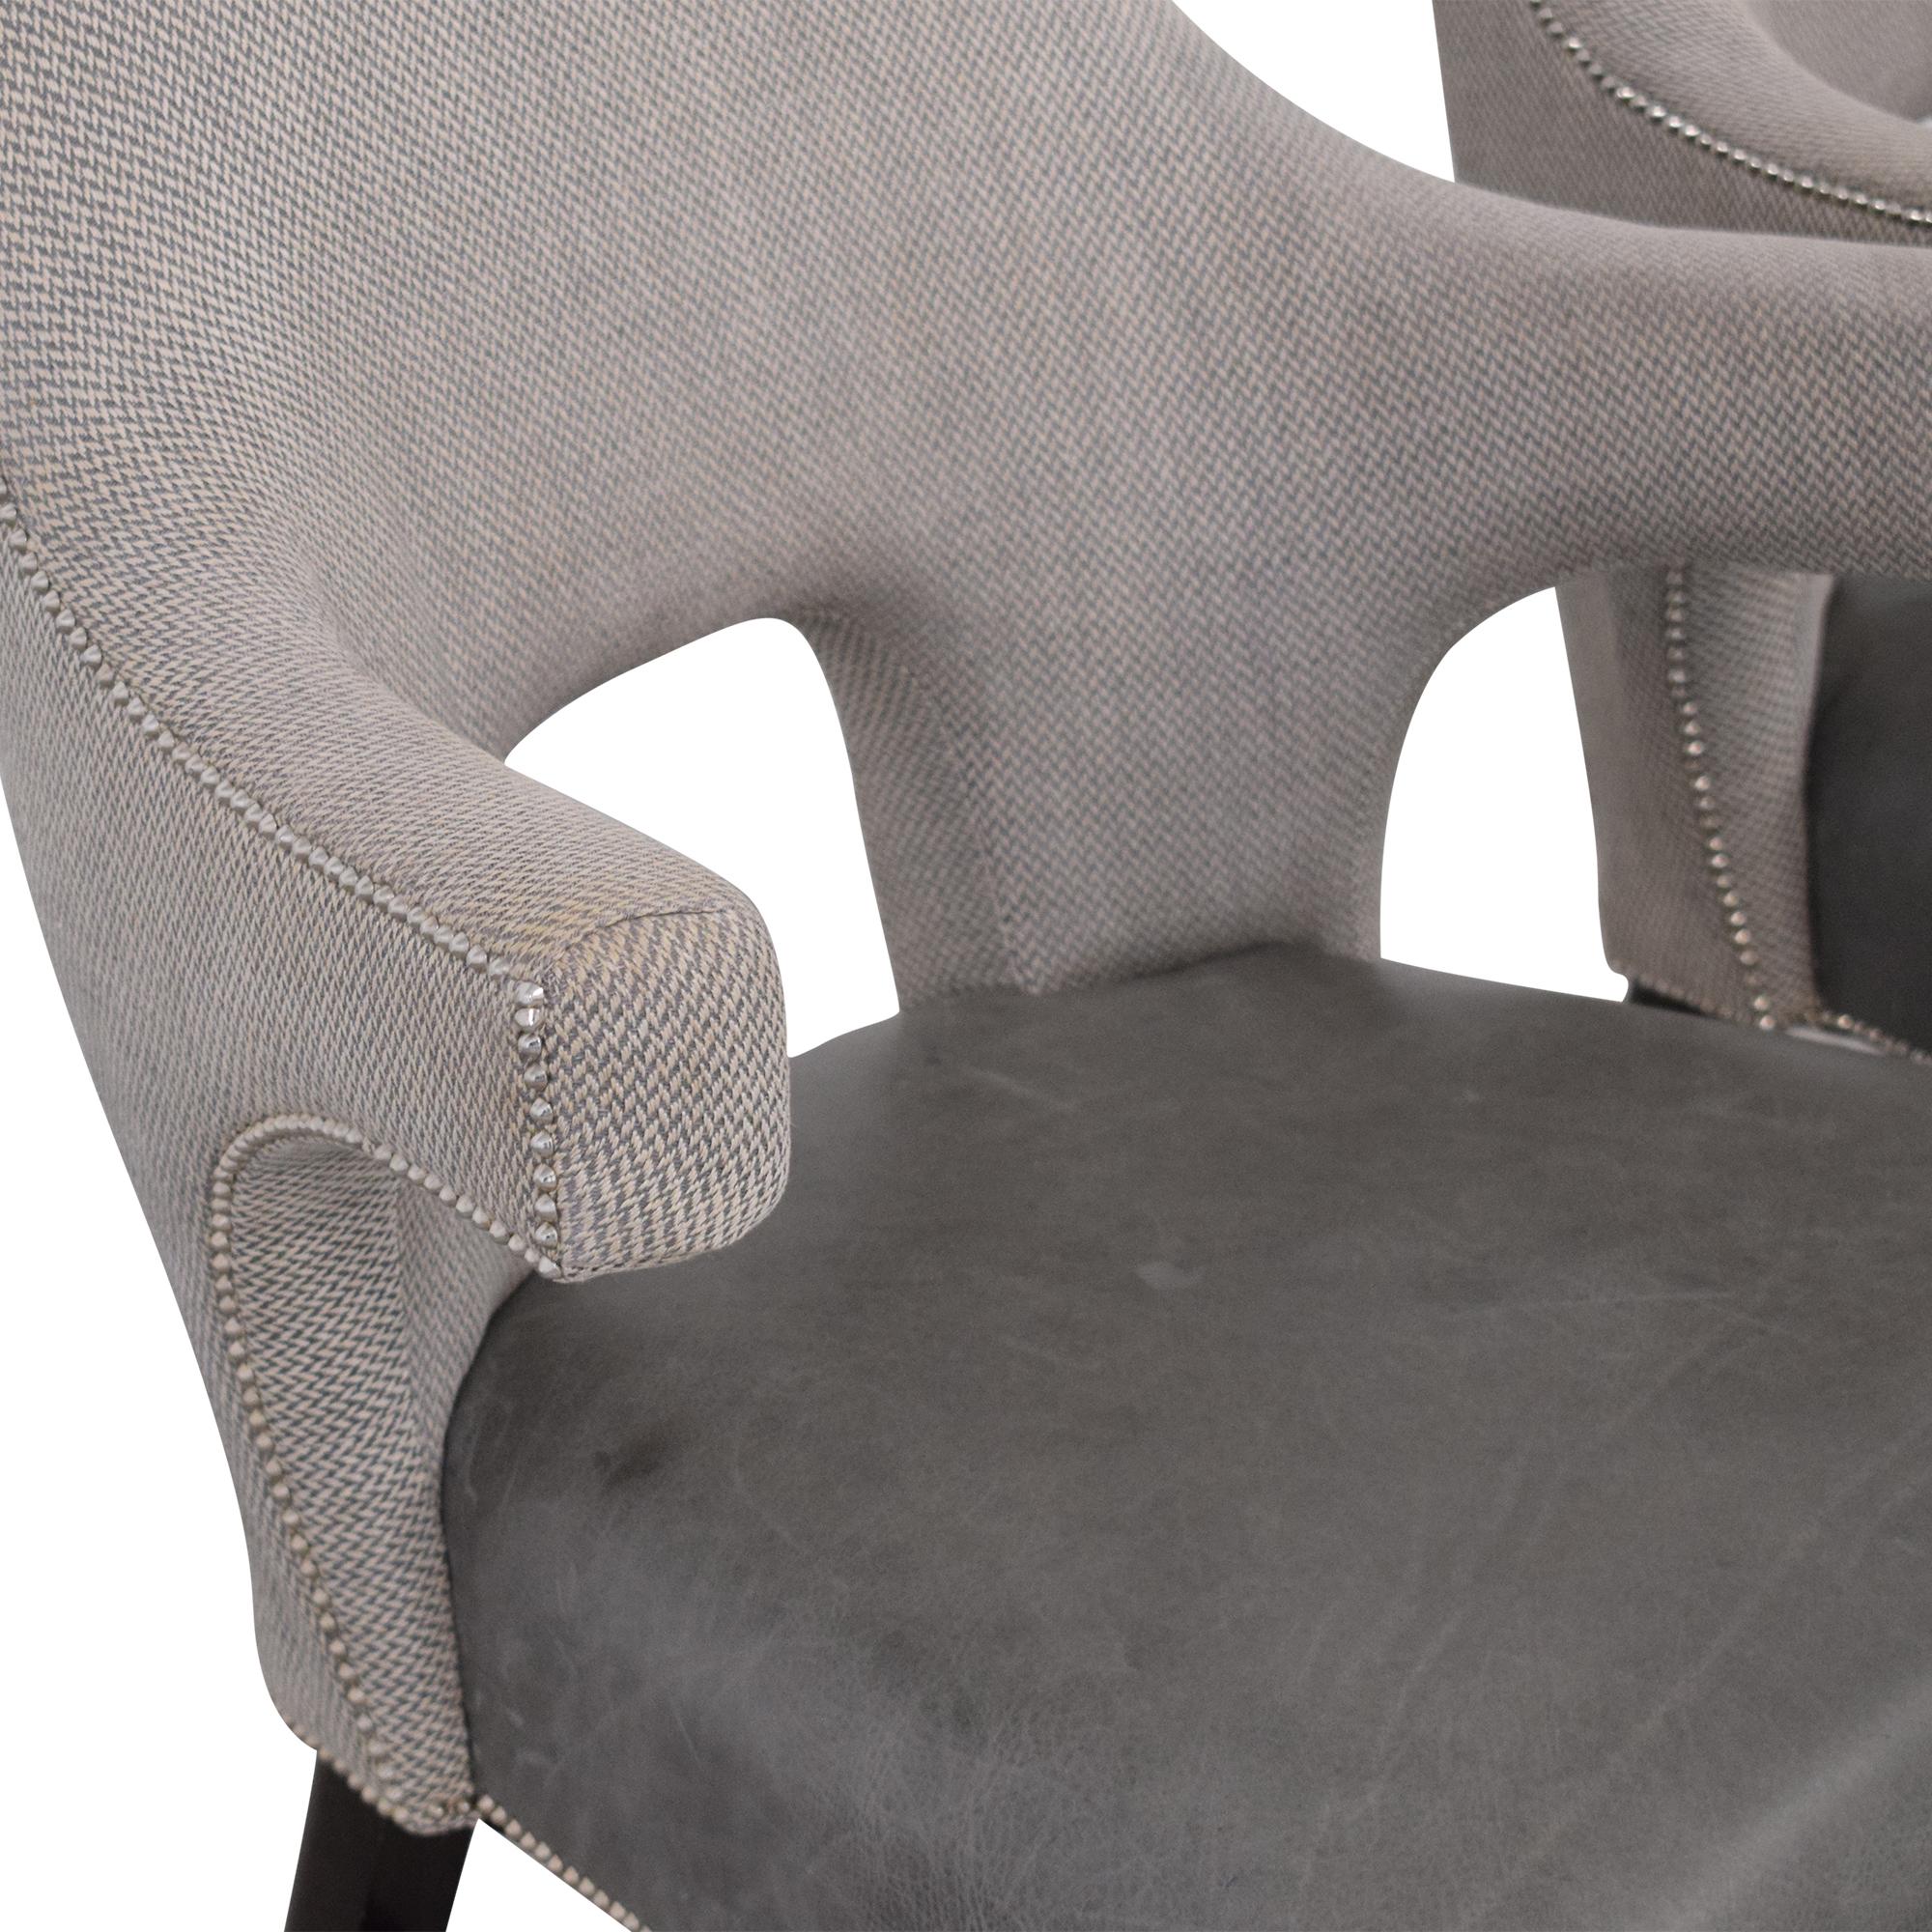 Thom Filicia Thom Filicia Modern Dining Chairs nyc